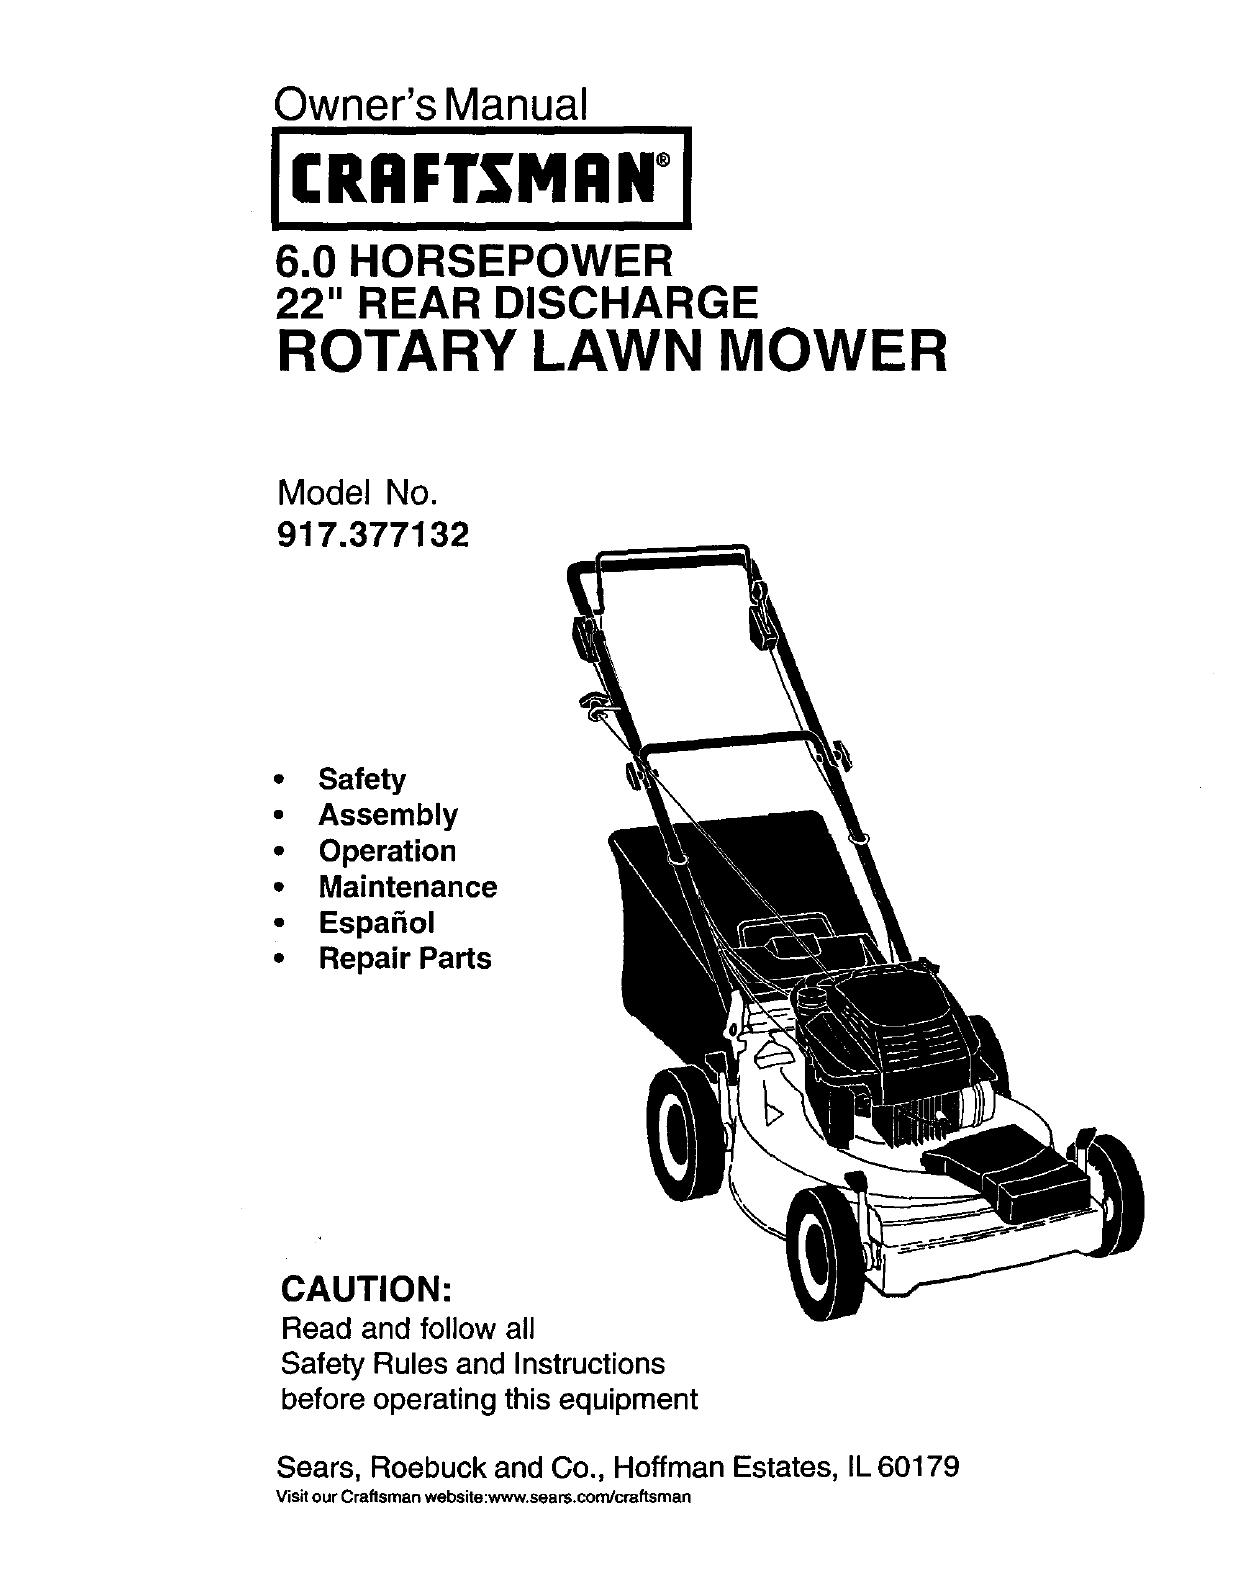 Craftsman 60 Lawn Mower Engine Diagram And Parts List For Walkbehindlawnmower 917377132 User Manual Gas Walk Behind Lawnmower Manuals Rh Usermanual Wiki Wont Stay Ru